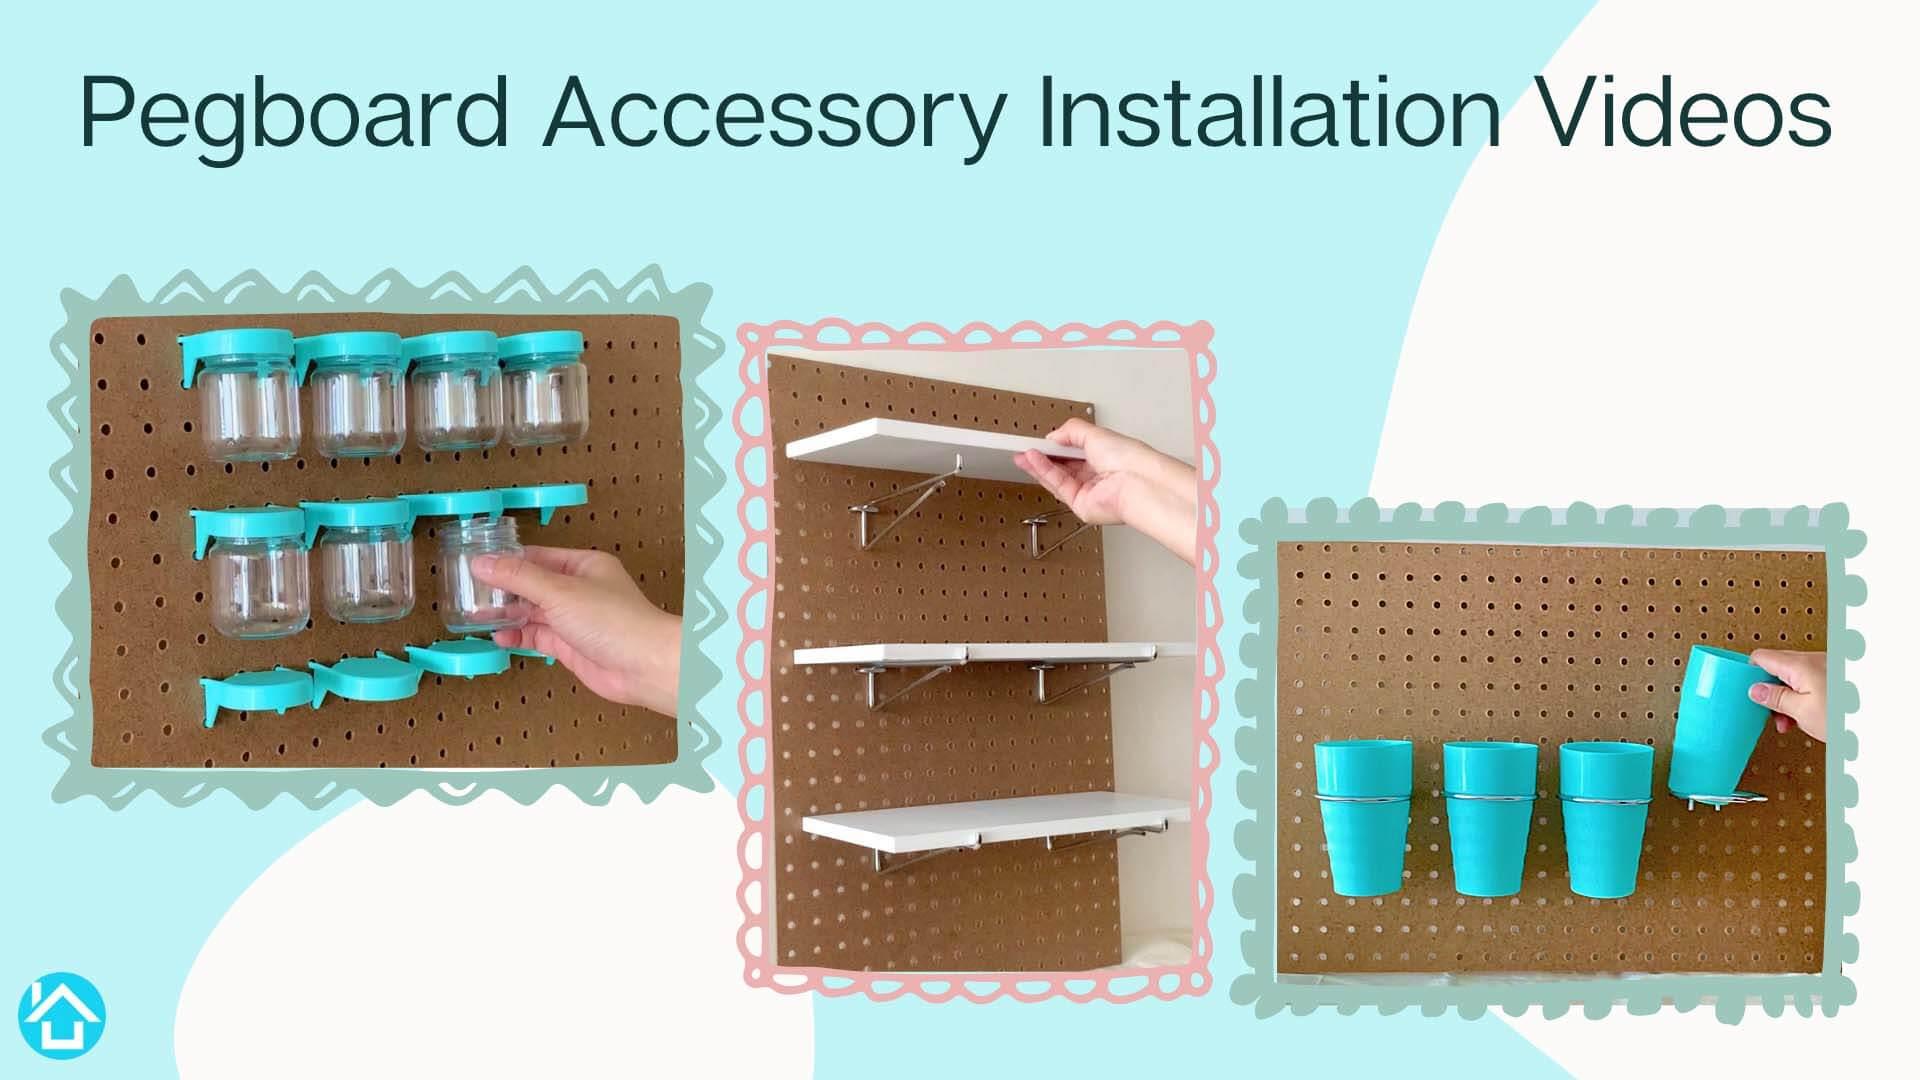 Pegboard Accessory Installation Videos